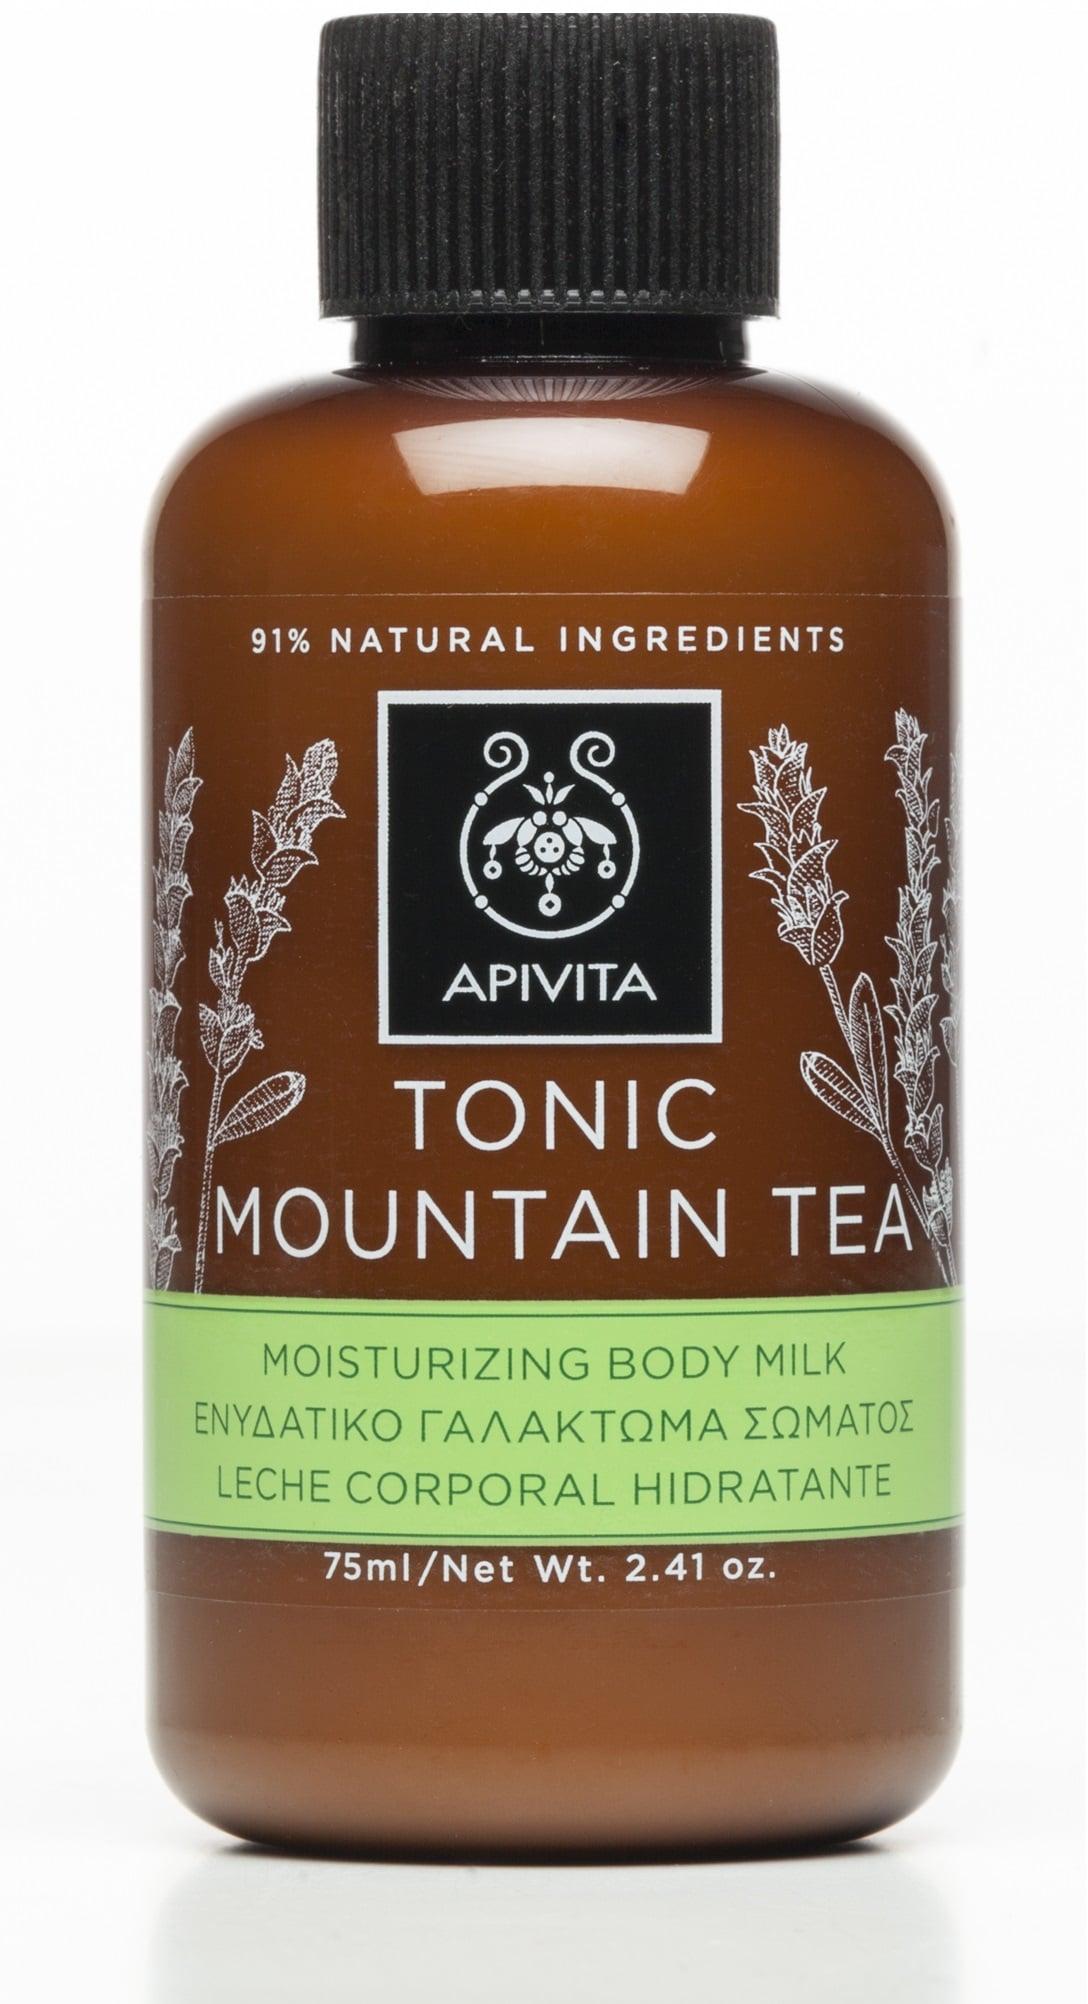 Apivita Tonic Mountain Tea Γαλάκτωμα με Περγαμόντο & Πράσινο Τσάι, 75ml